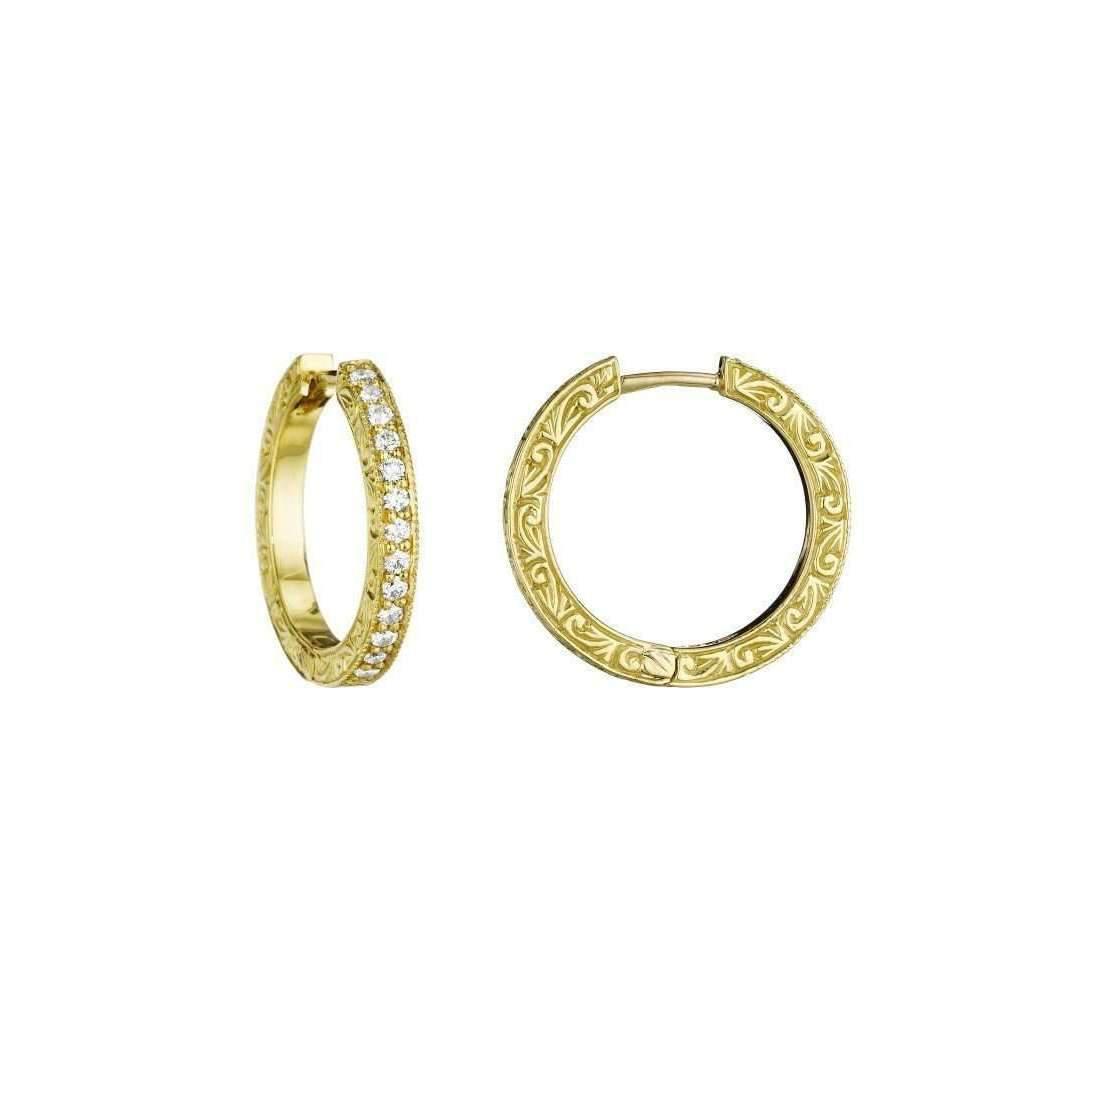 Penny Preville Oval Diamond Hoop Earrings 9uANtRFde3